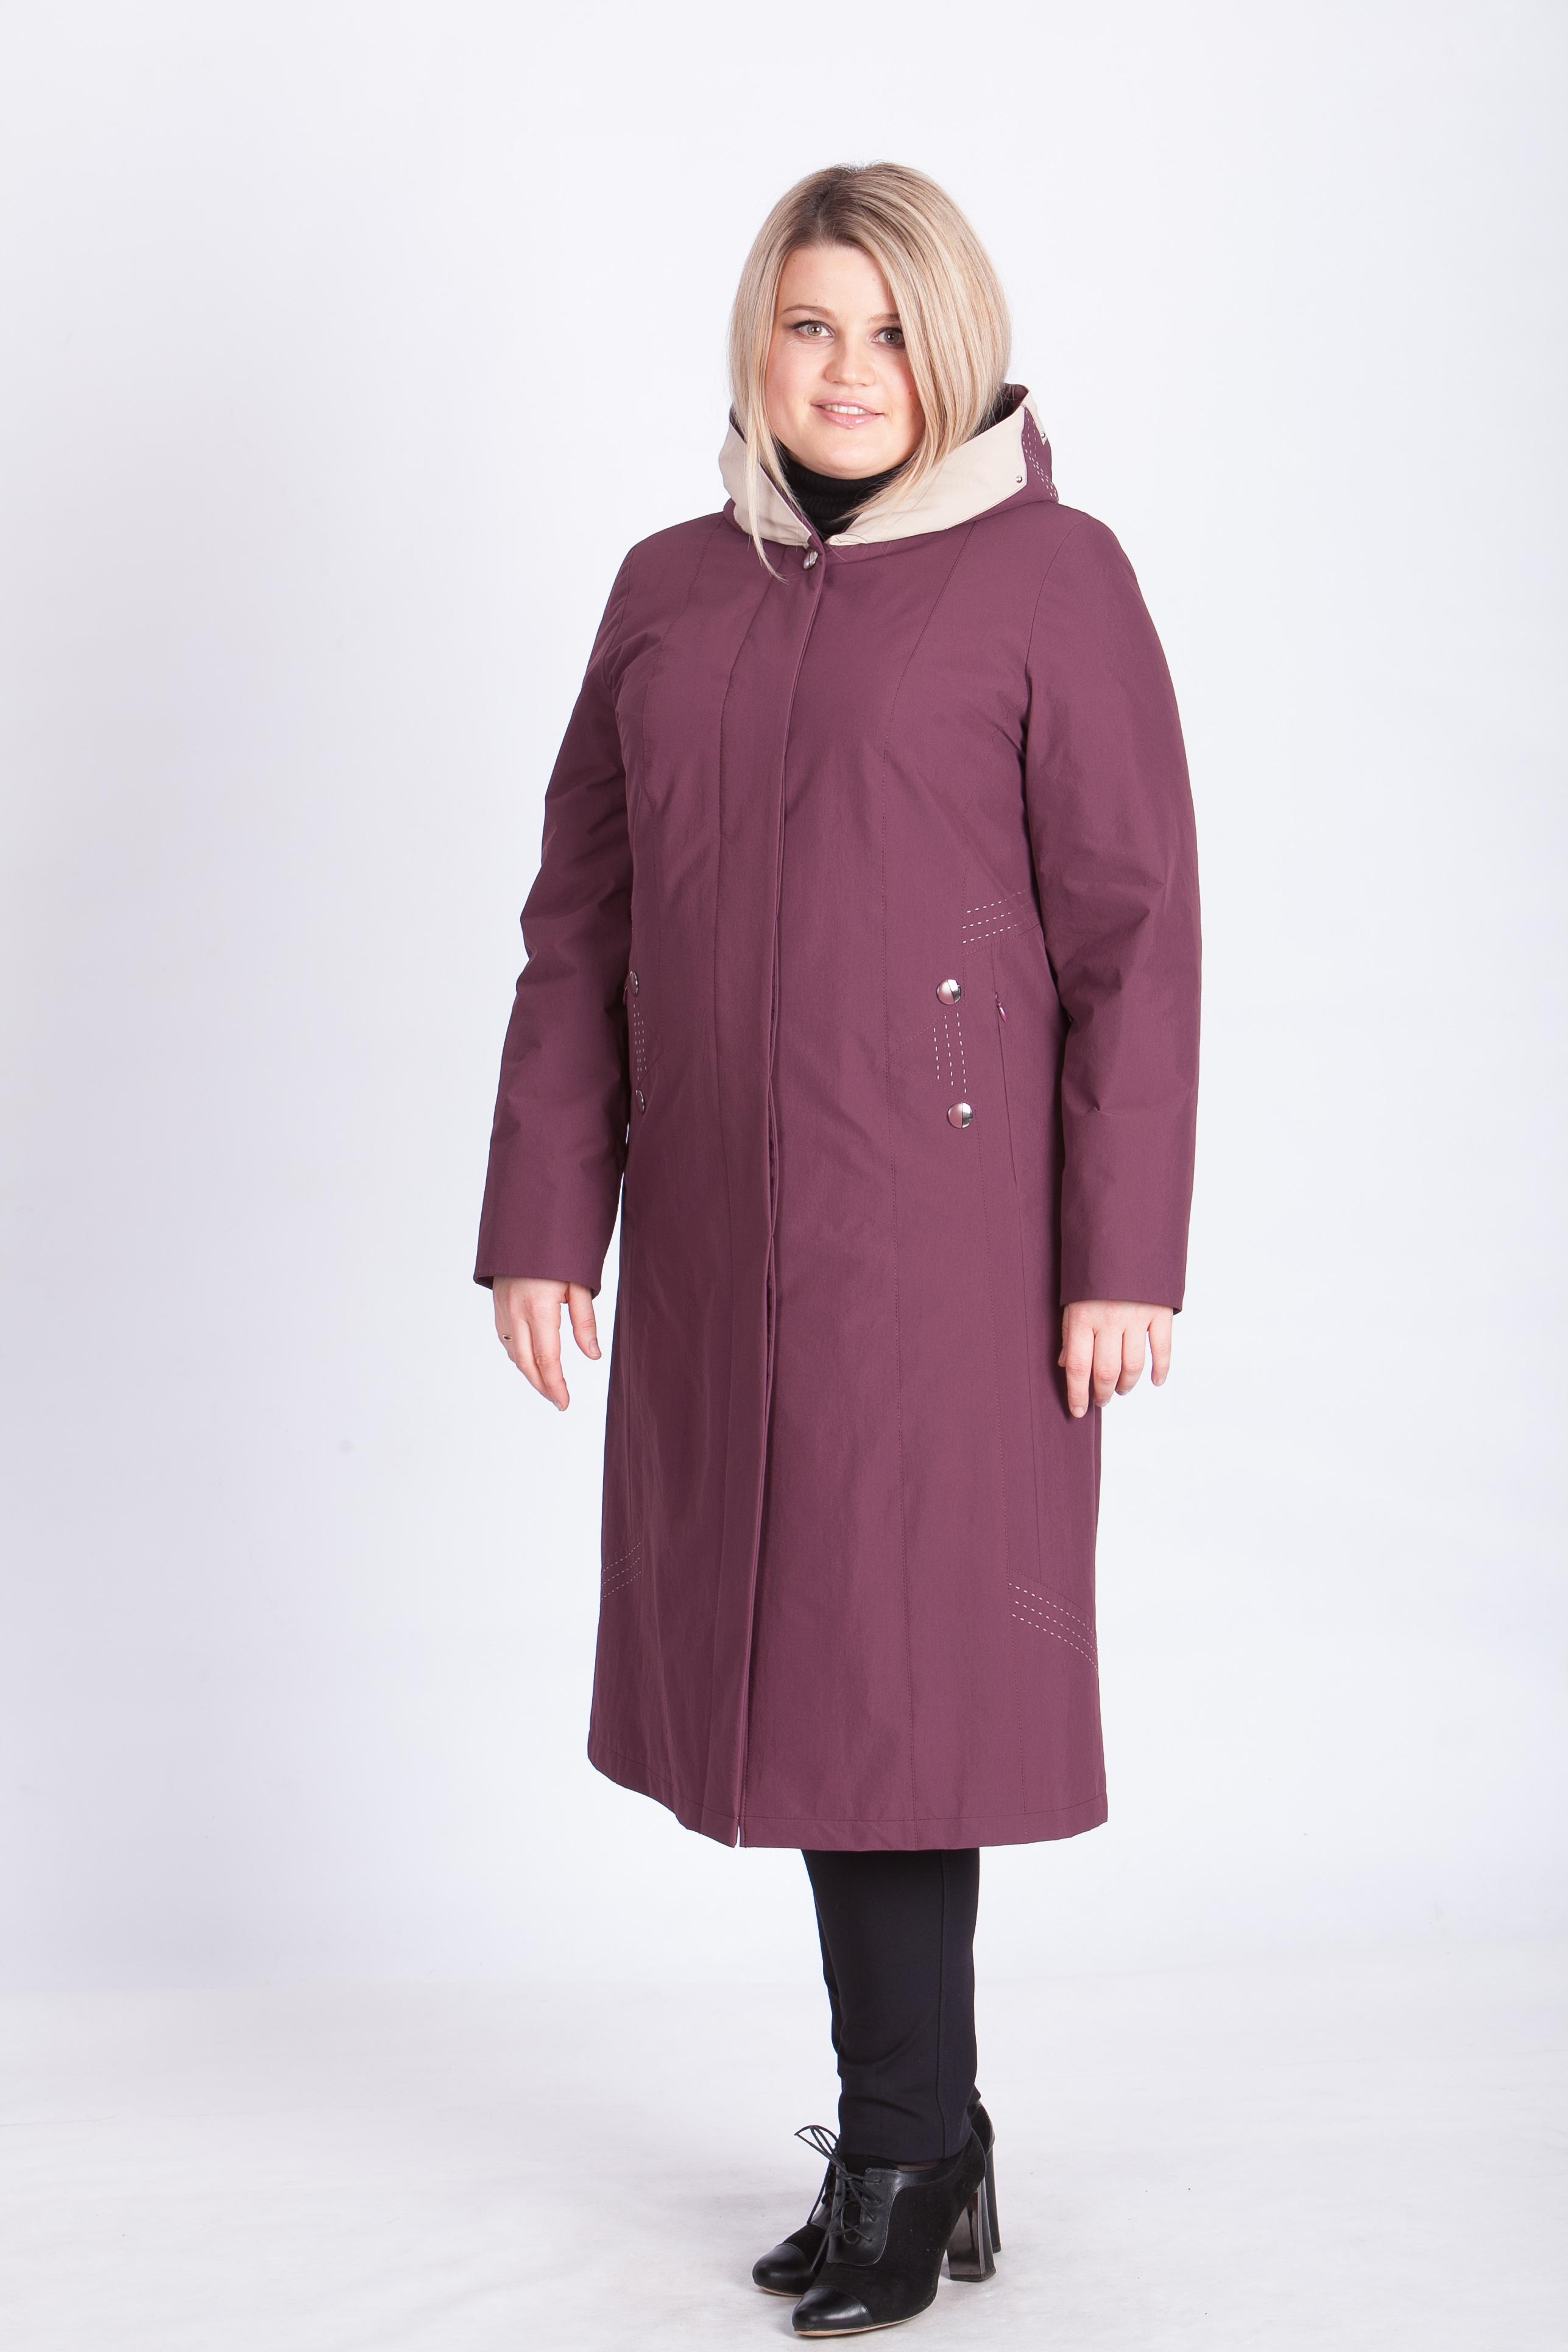 Модель: ЕП 987, Цвет баклажан, размер 54 . Цена 11500 рублей.